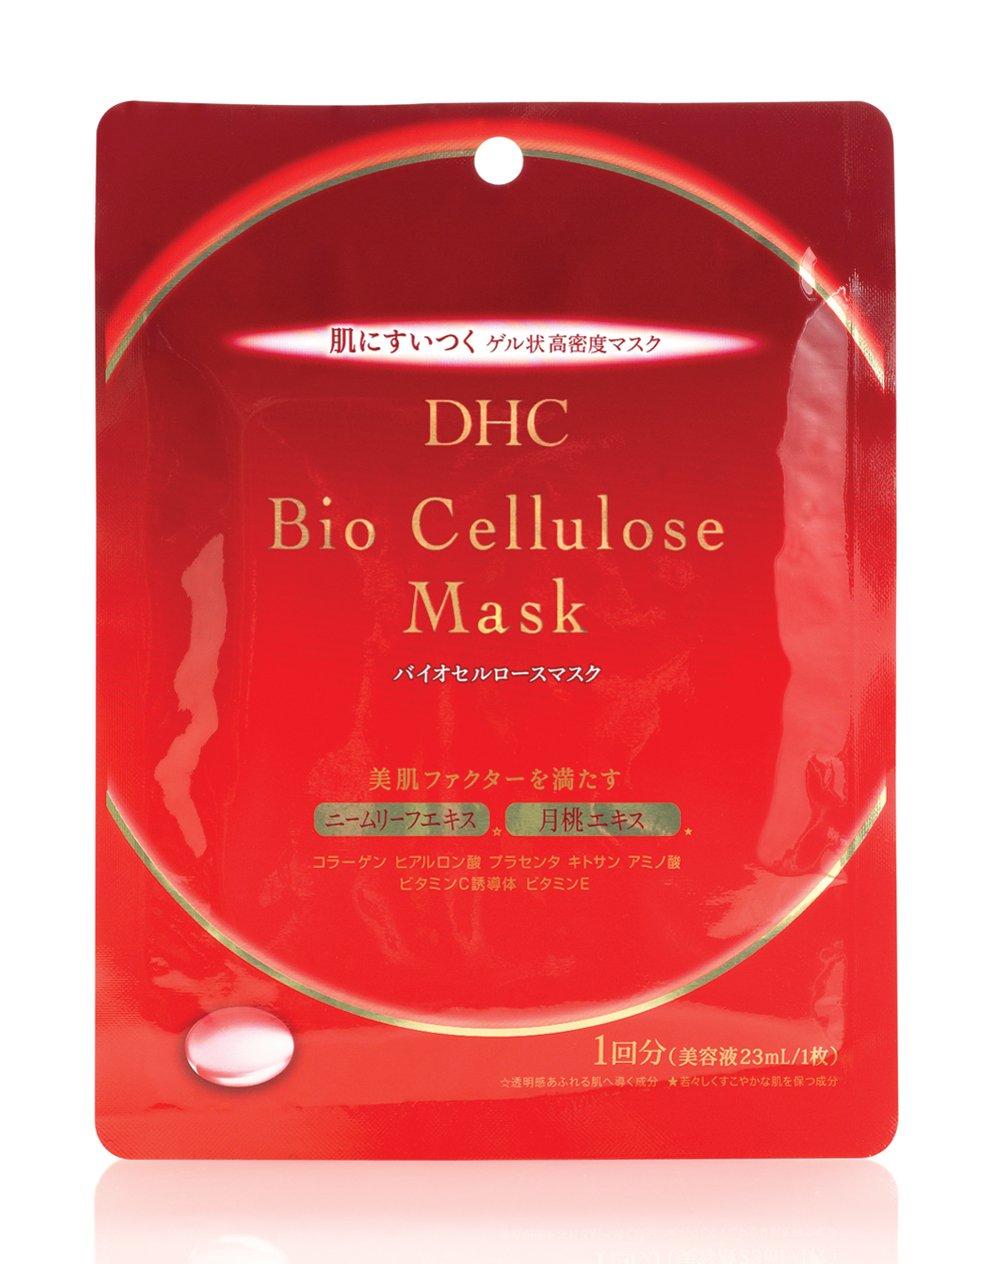 DHC Bio Cellulose Mask 22122